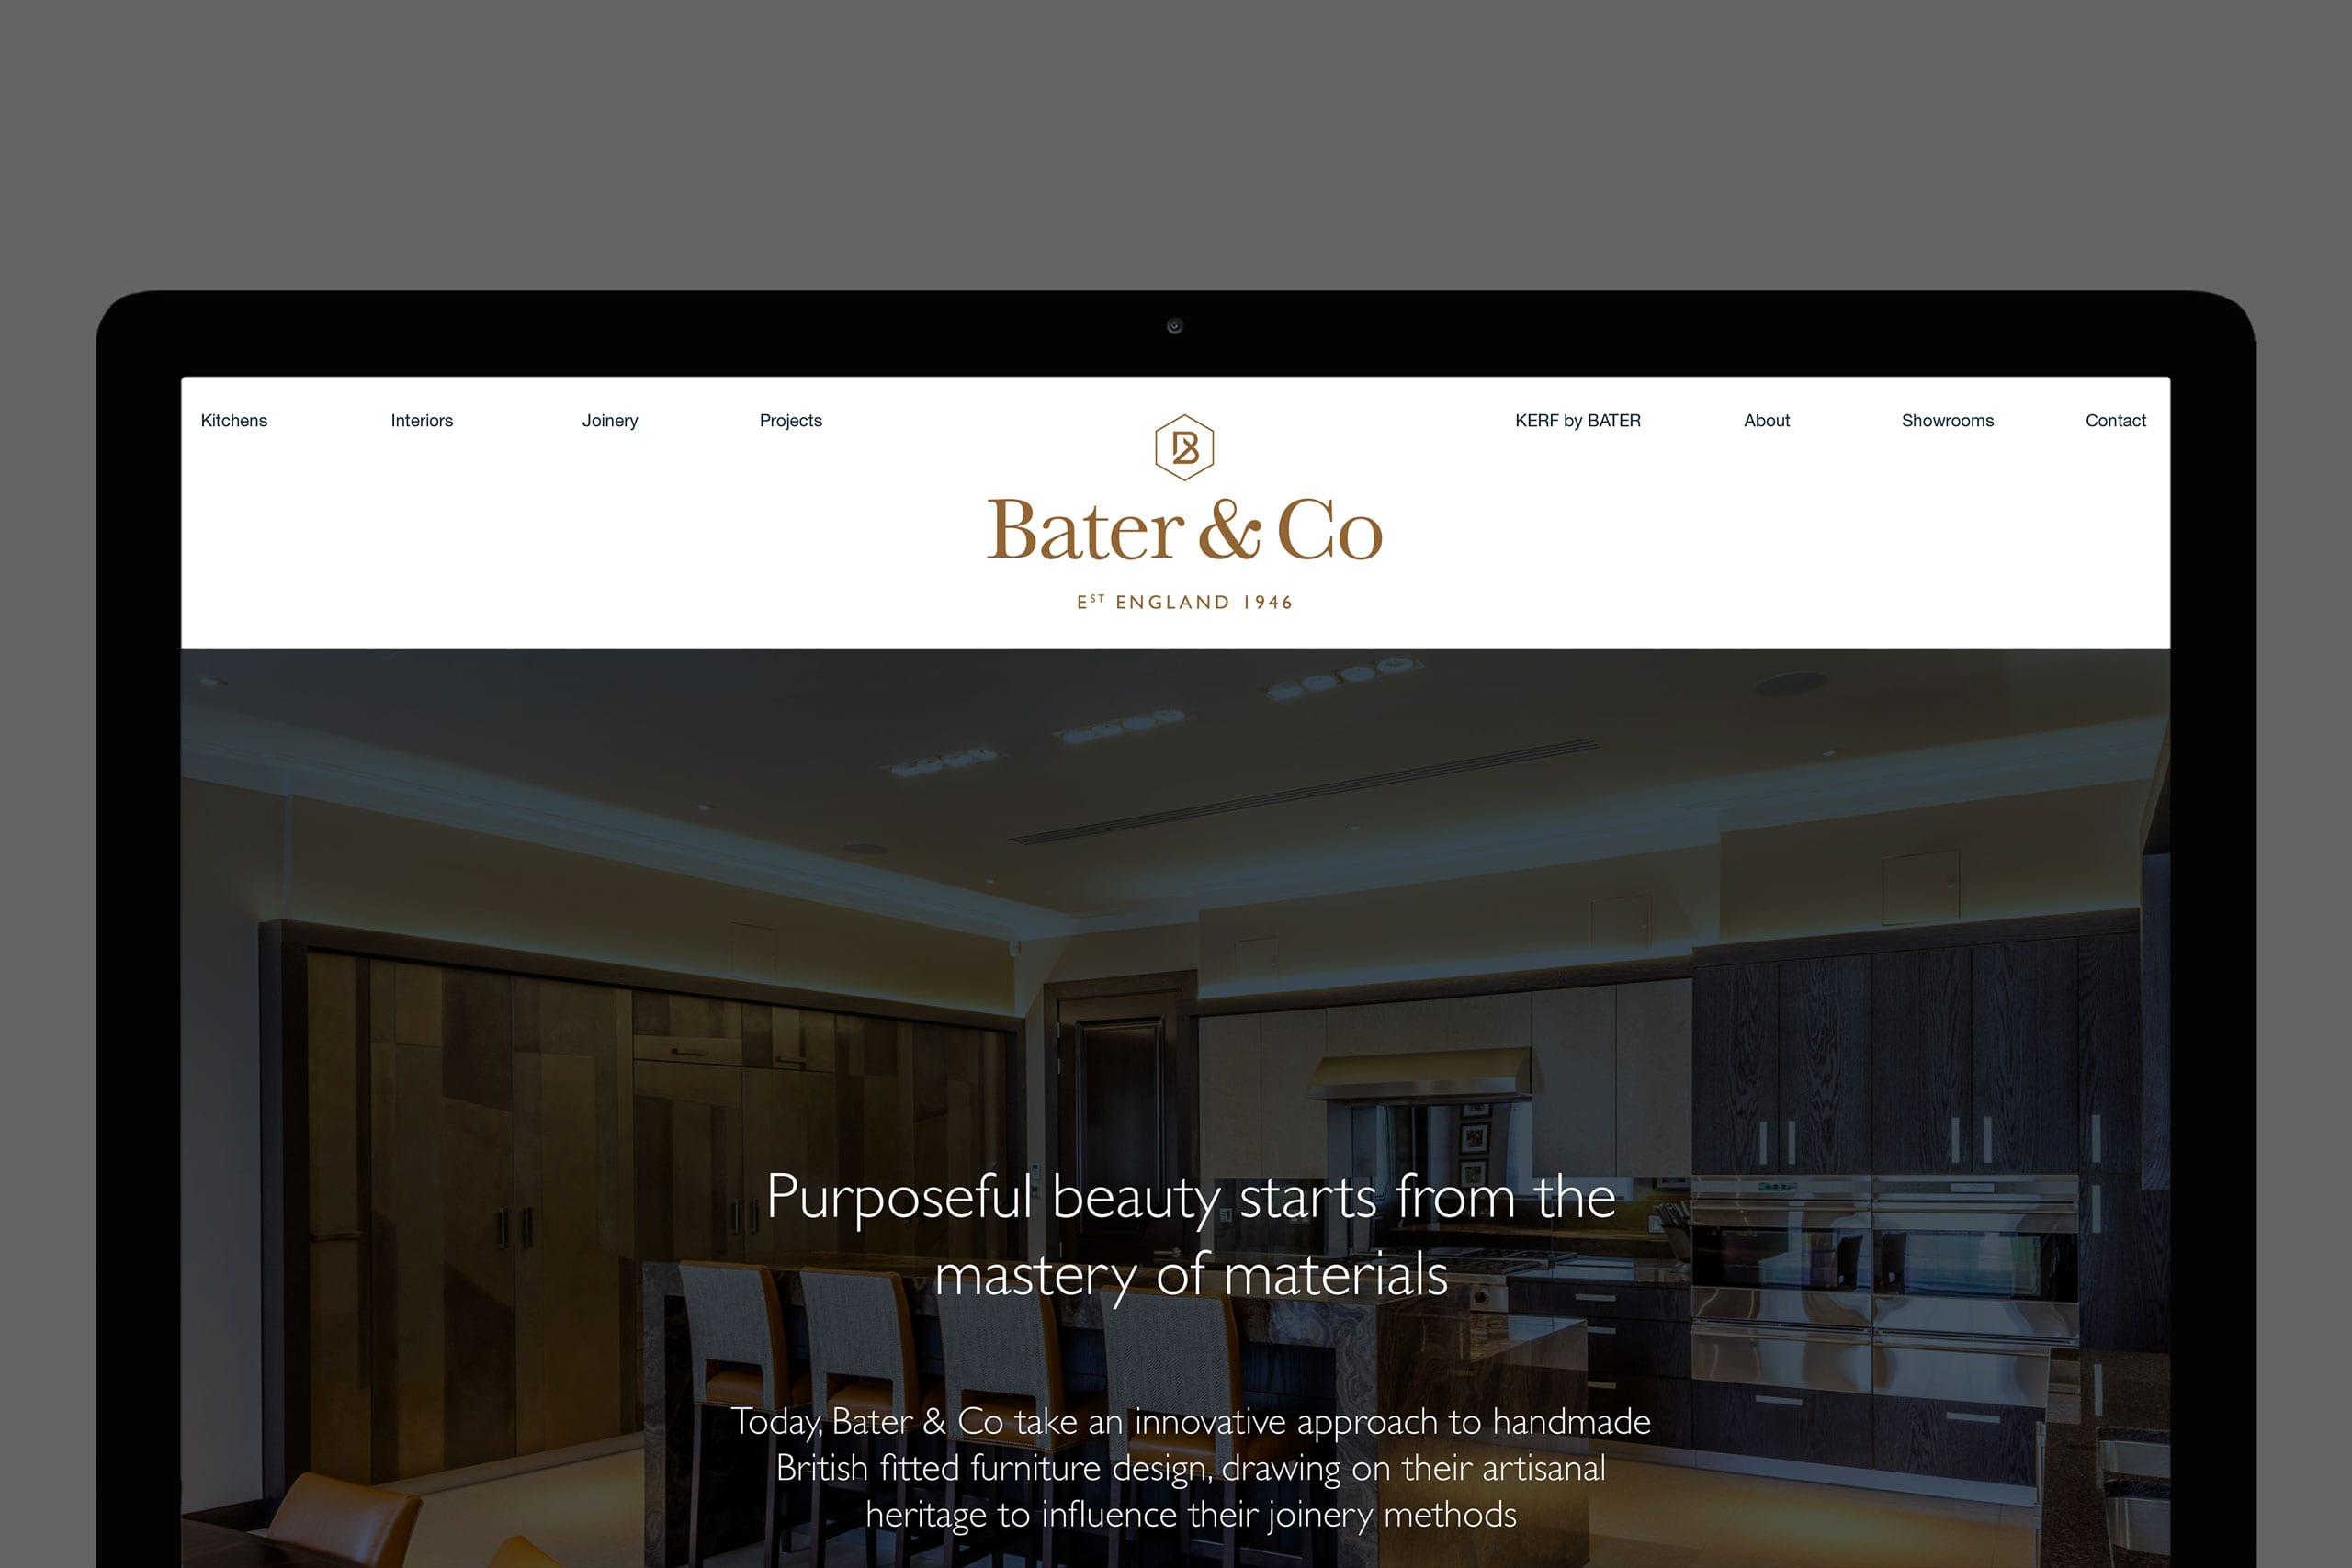 Bater & Co